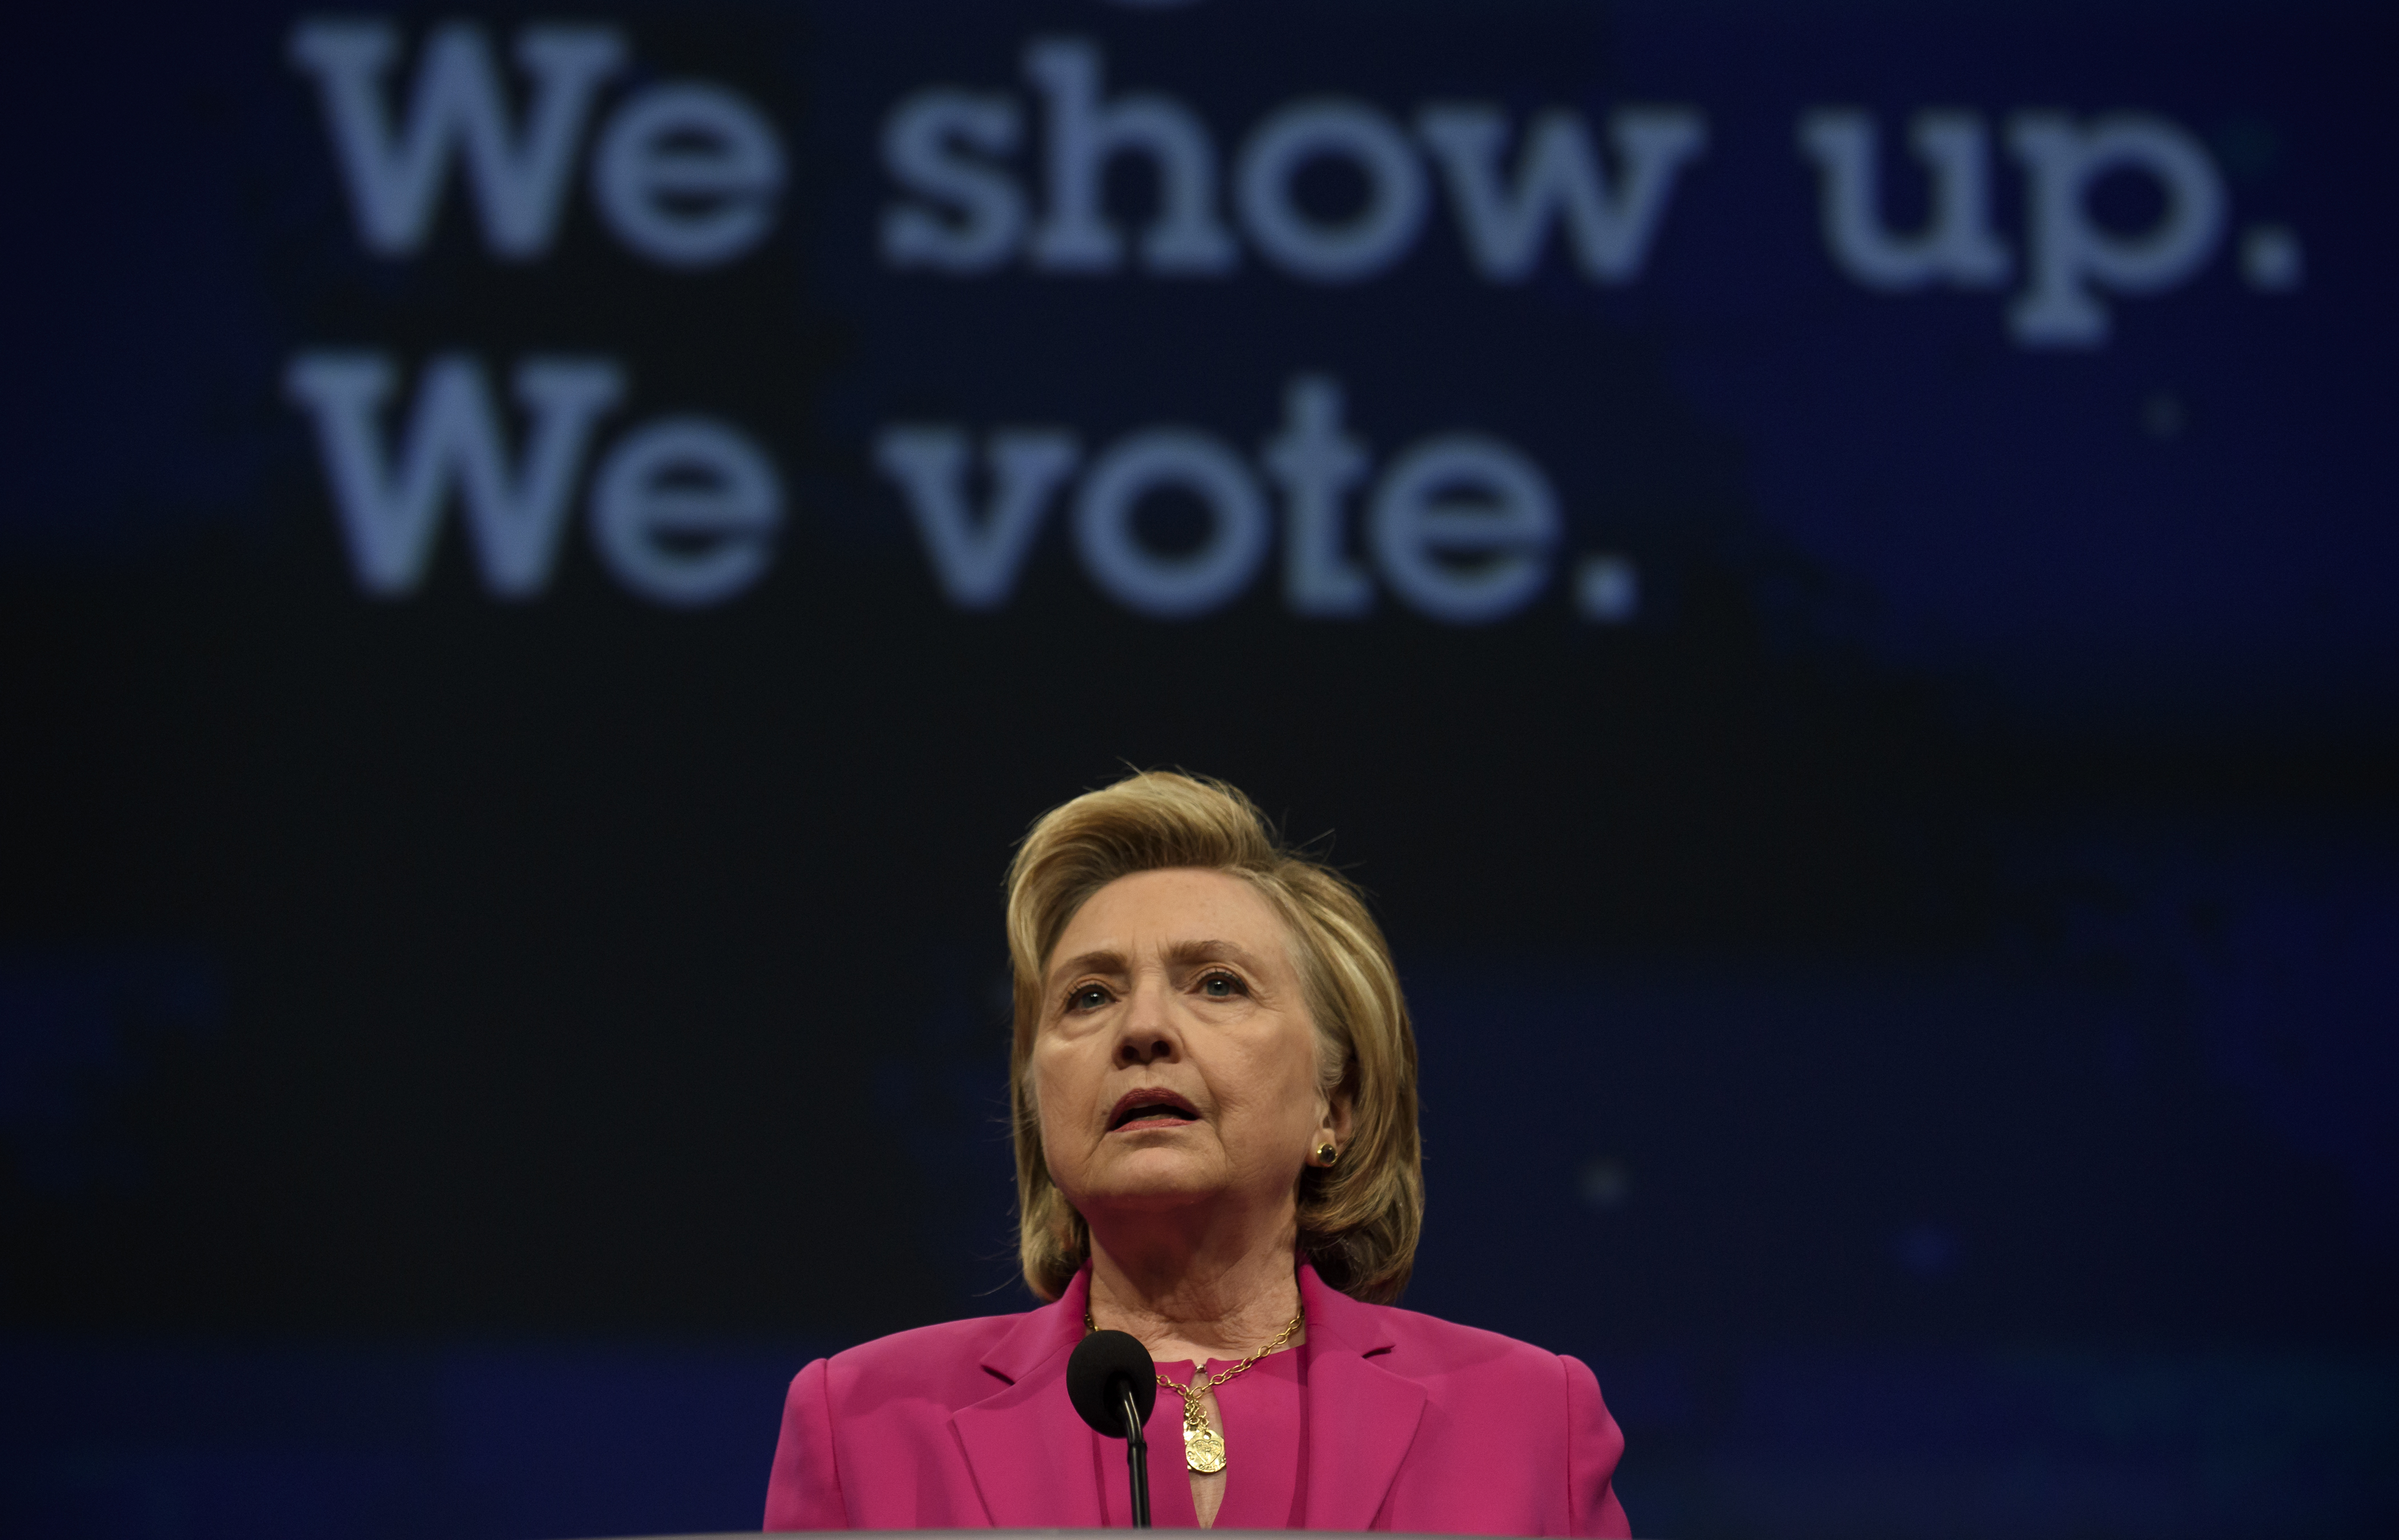 Hillary Clintons View Of America Under Trump Organized Cruelty